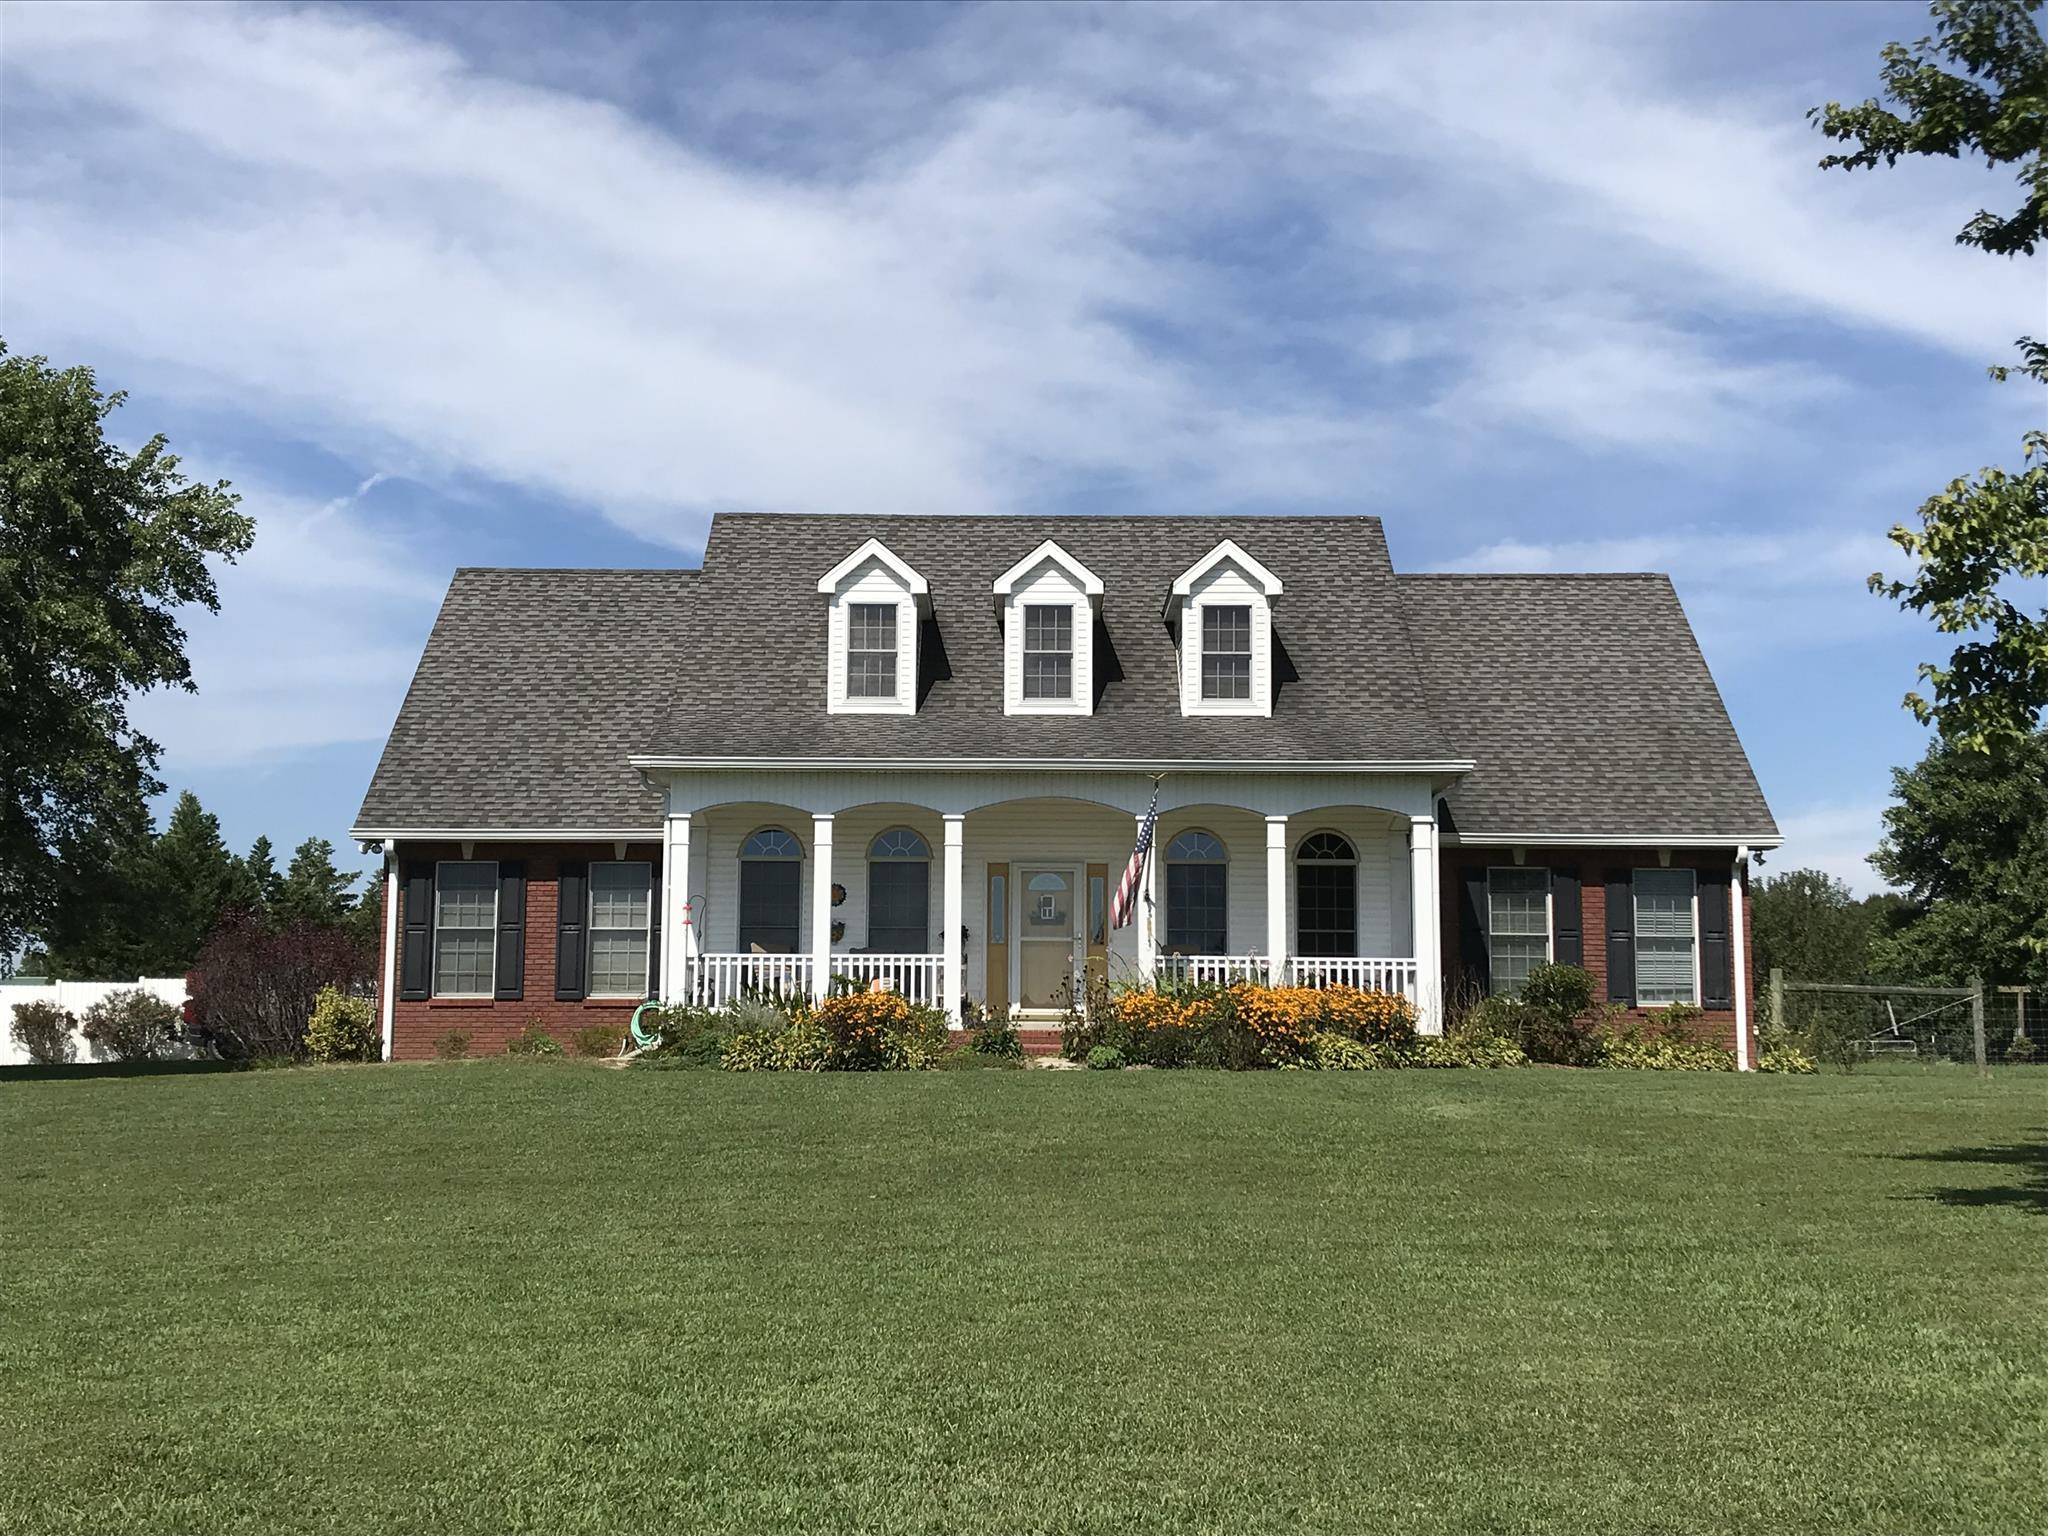 840 Oak Plains Rd, Clarksville, TN 37043 - Clarksville, TN real estate listing